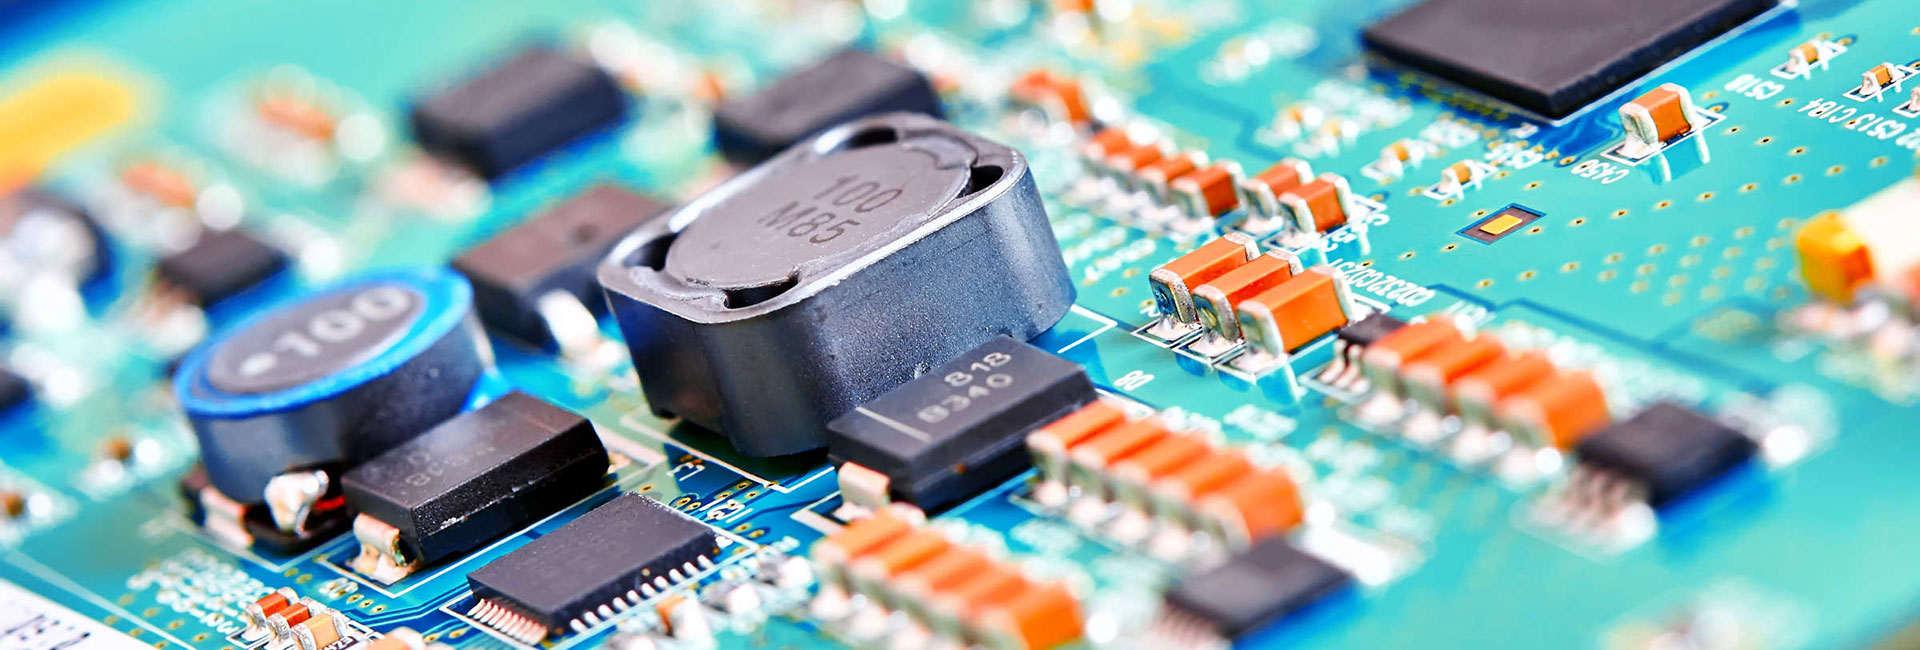 PCB Design and Custom Electronic Boards - Adgenera